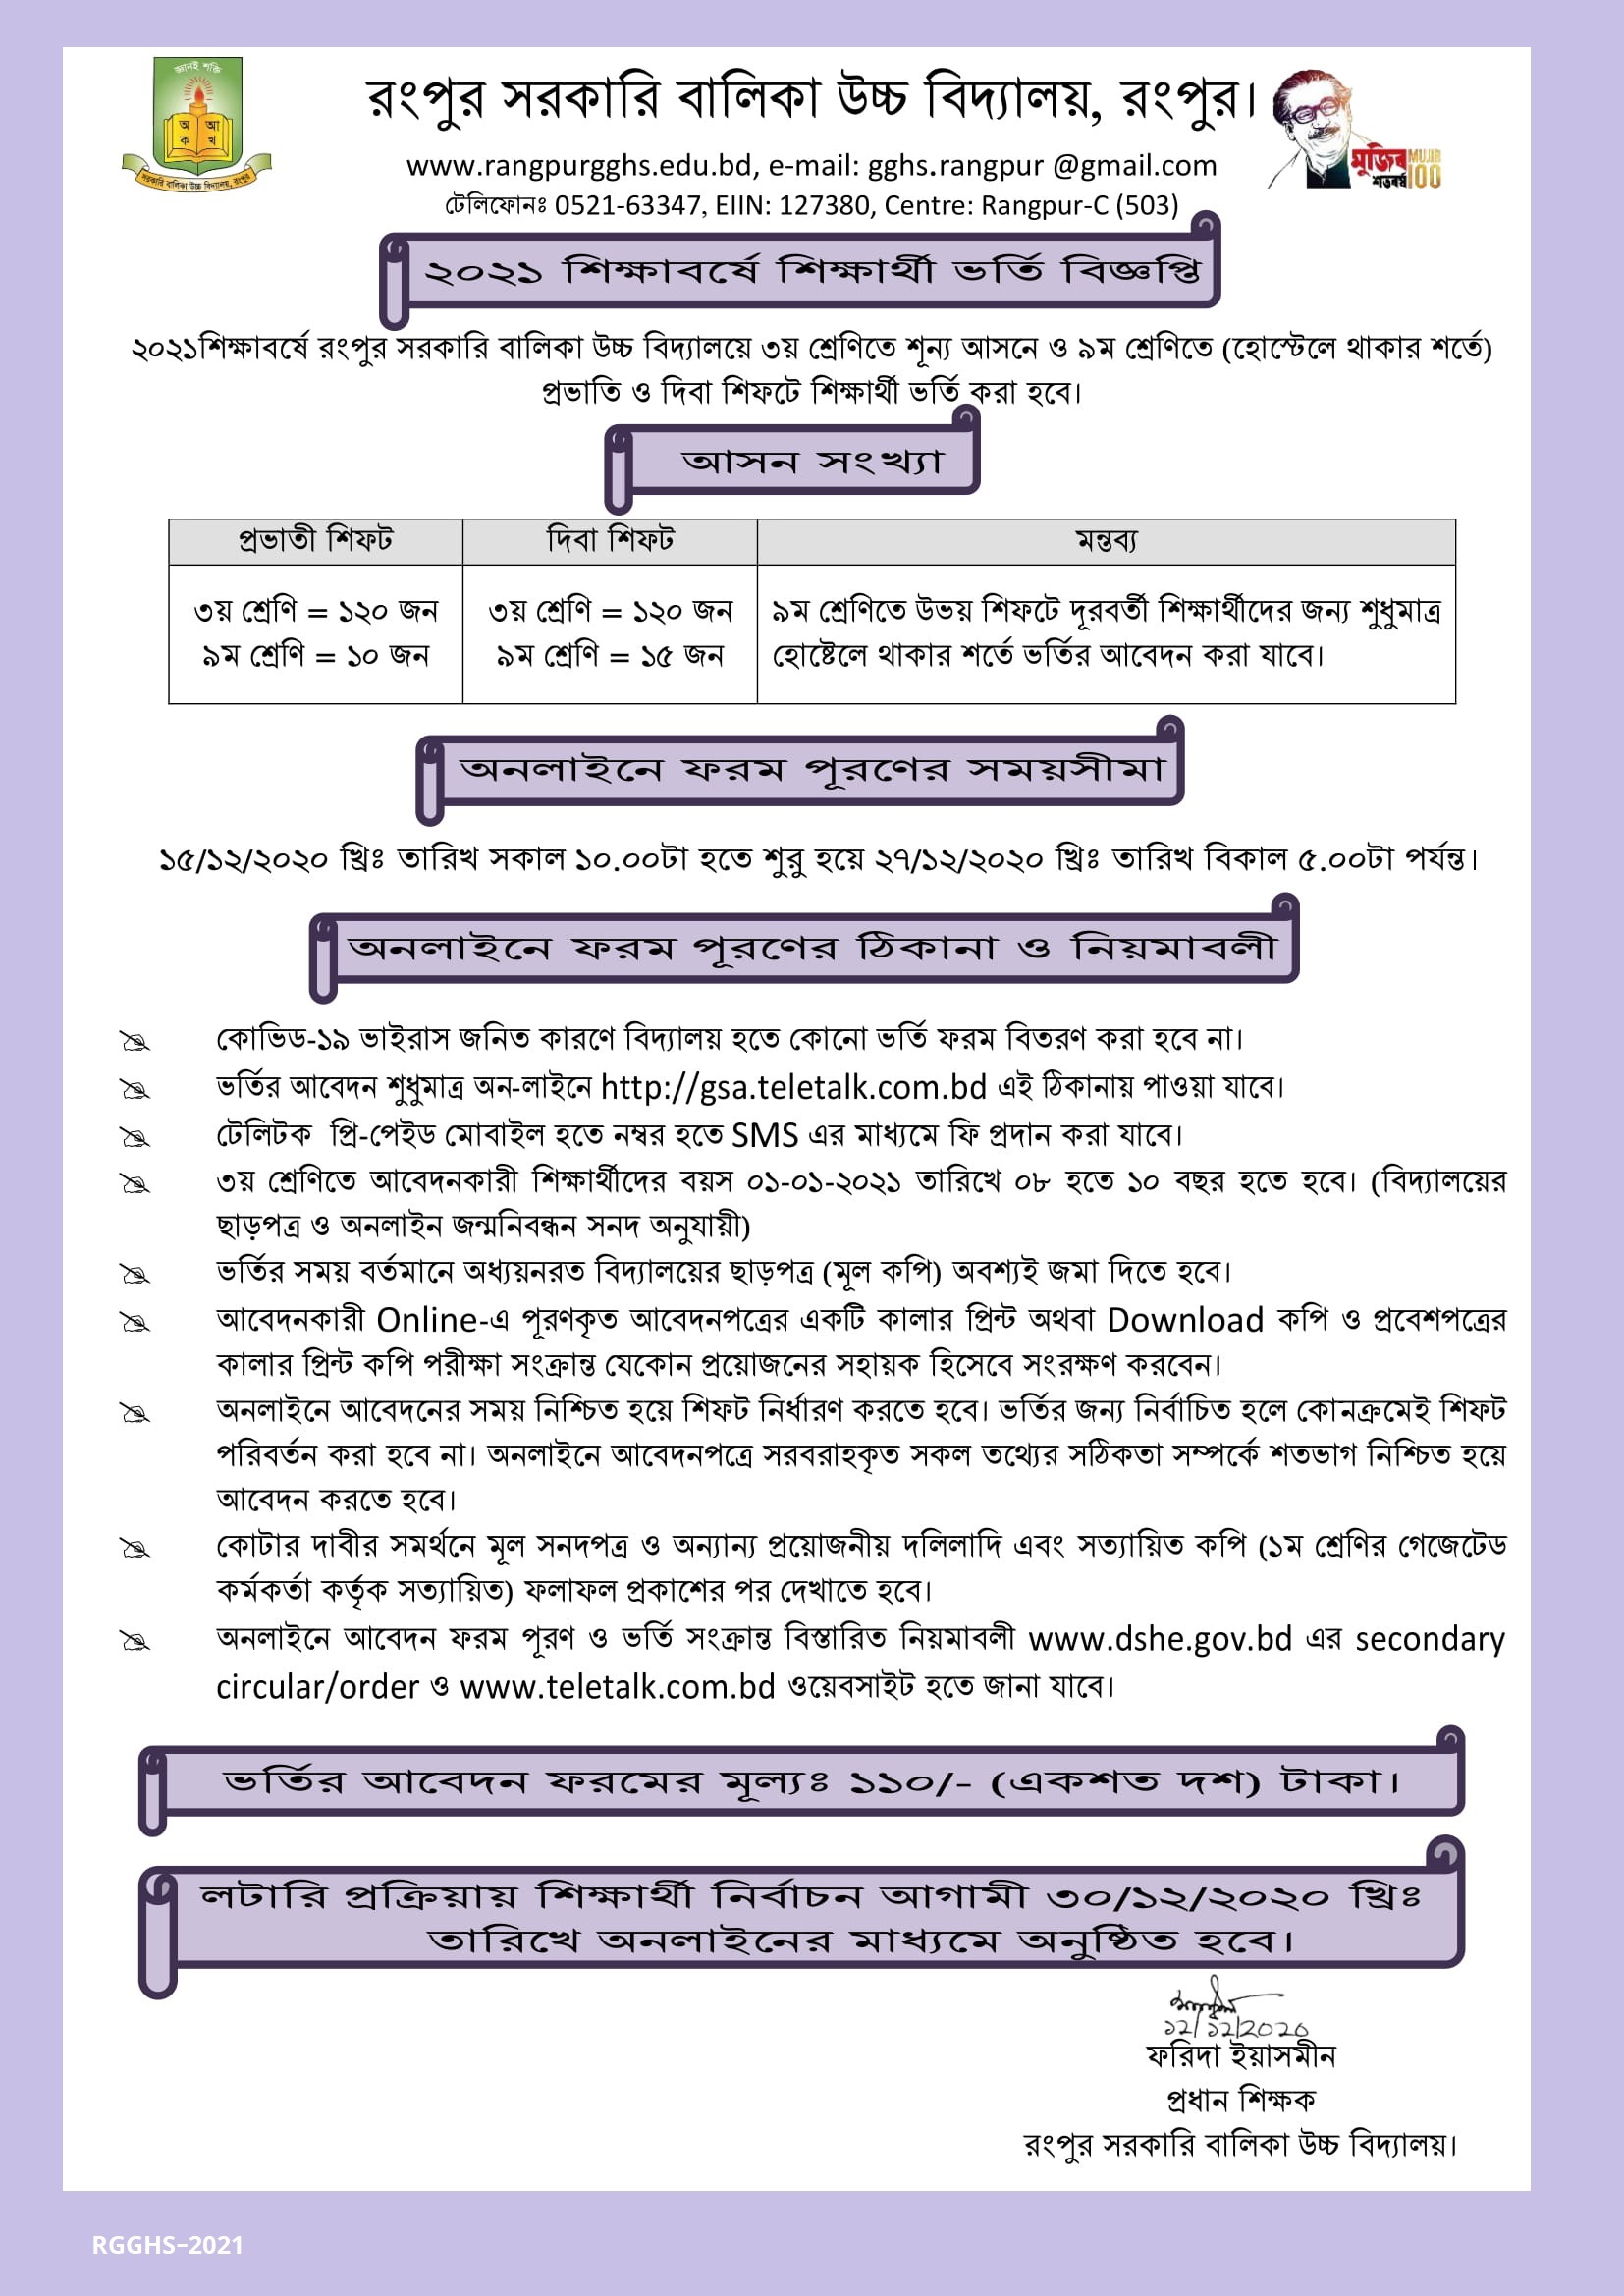 Rangpur Govt Girls High School Admission Circular 2021